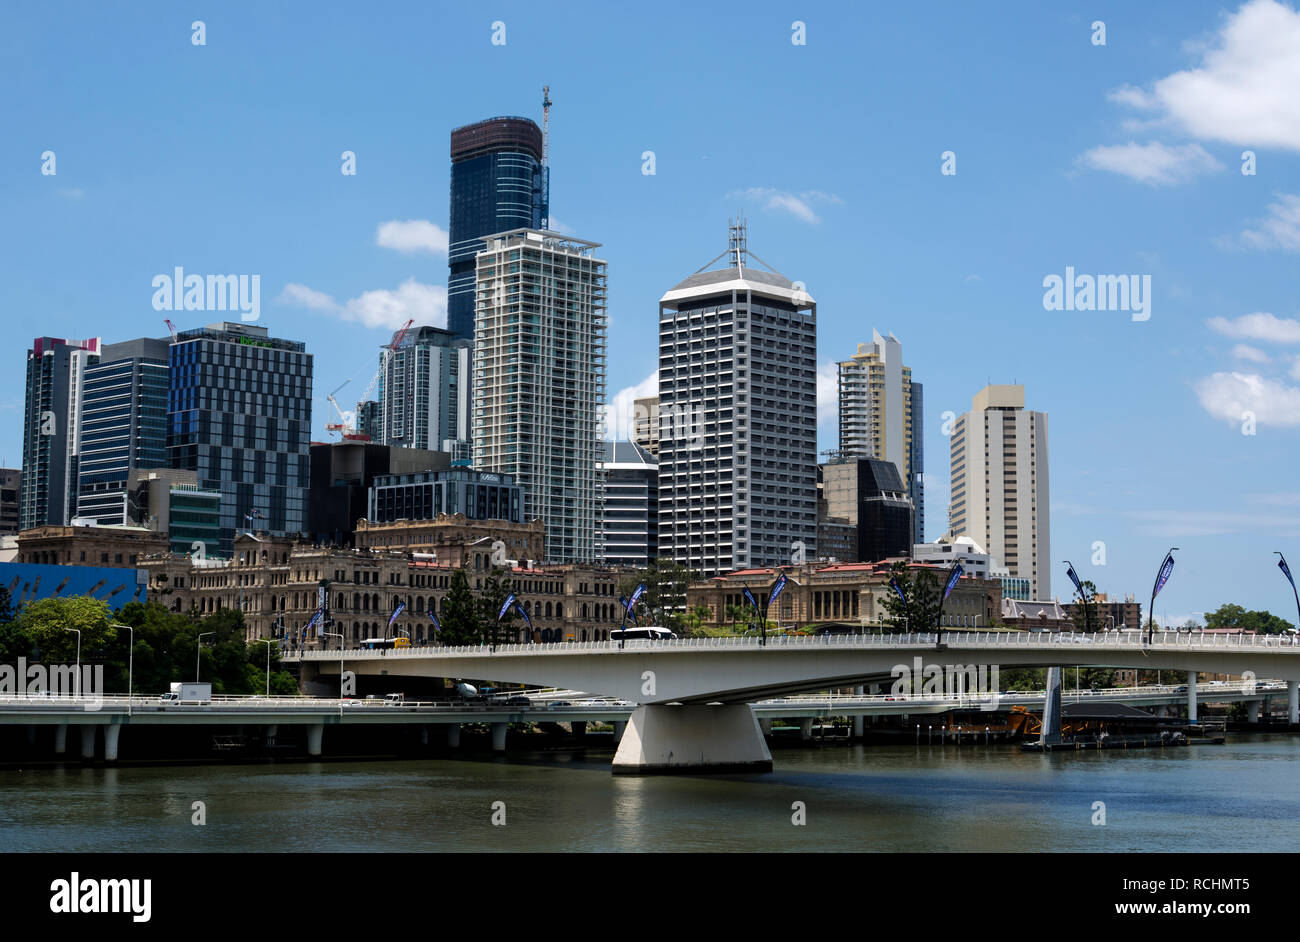 City centre and Victoria Bridge, Brisbane, Queensland, Australia - Stock Image